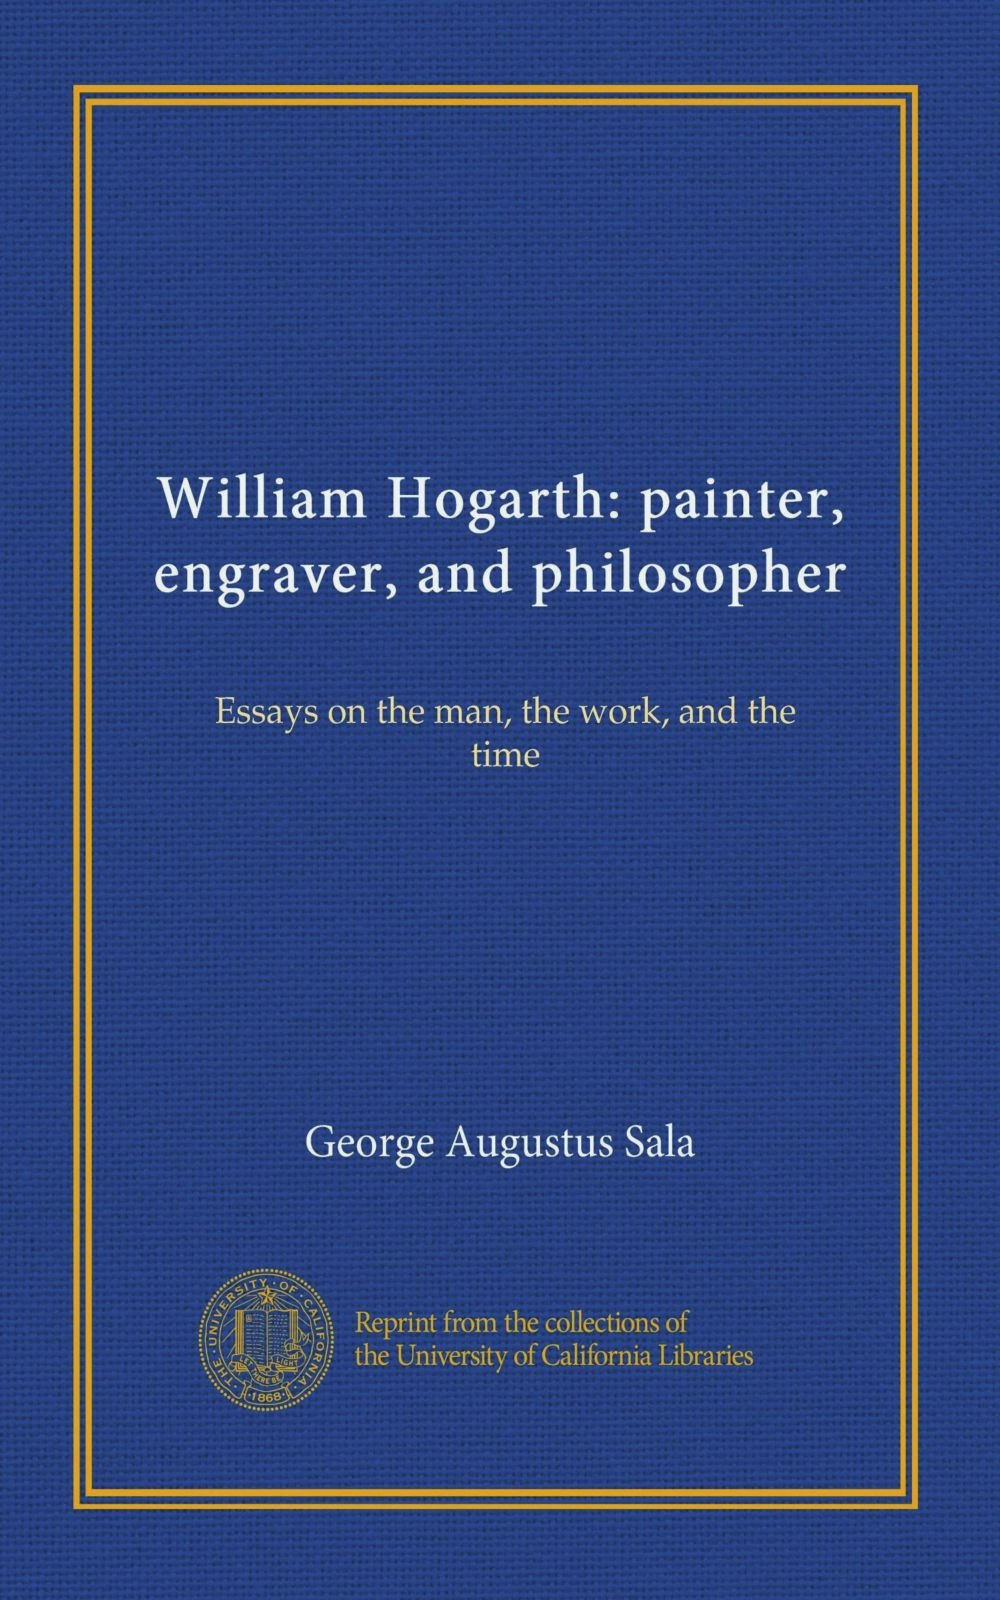 essays on william hogarth